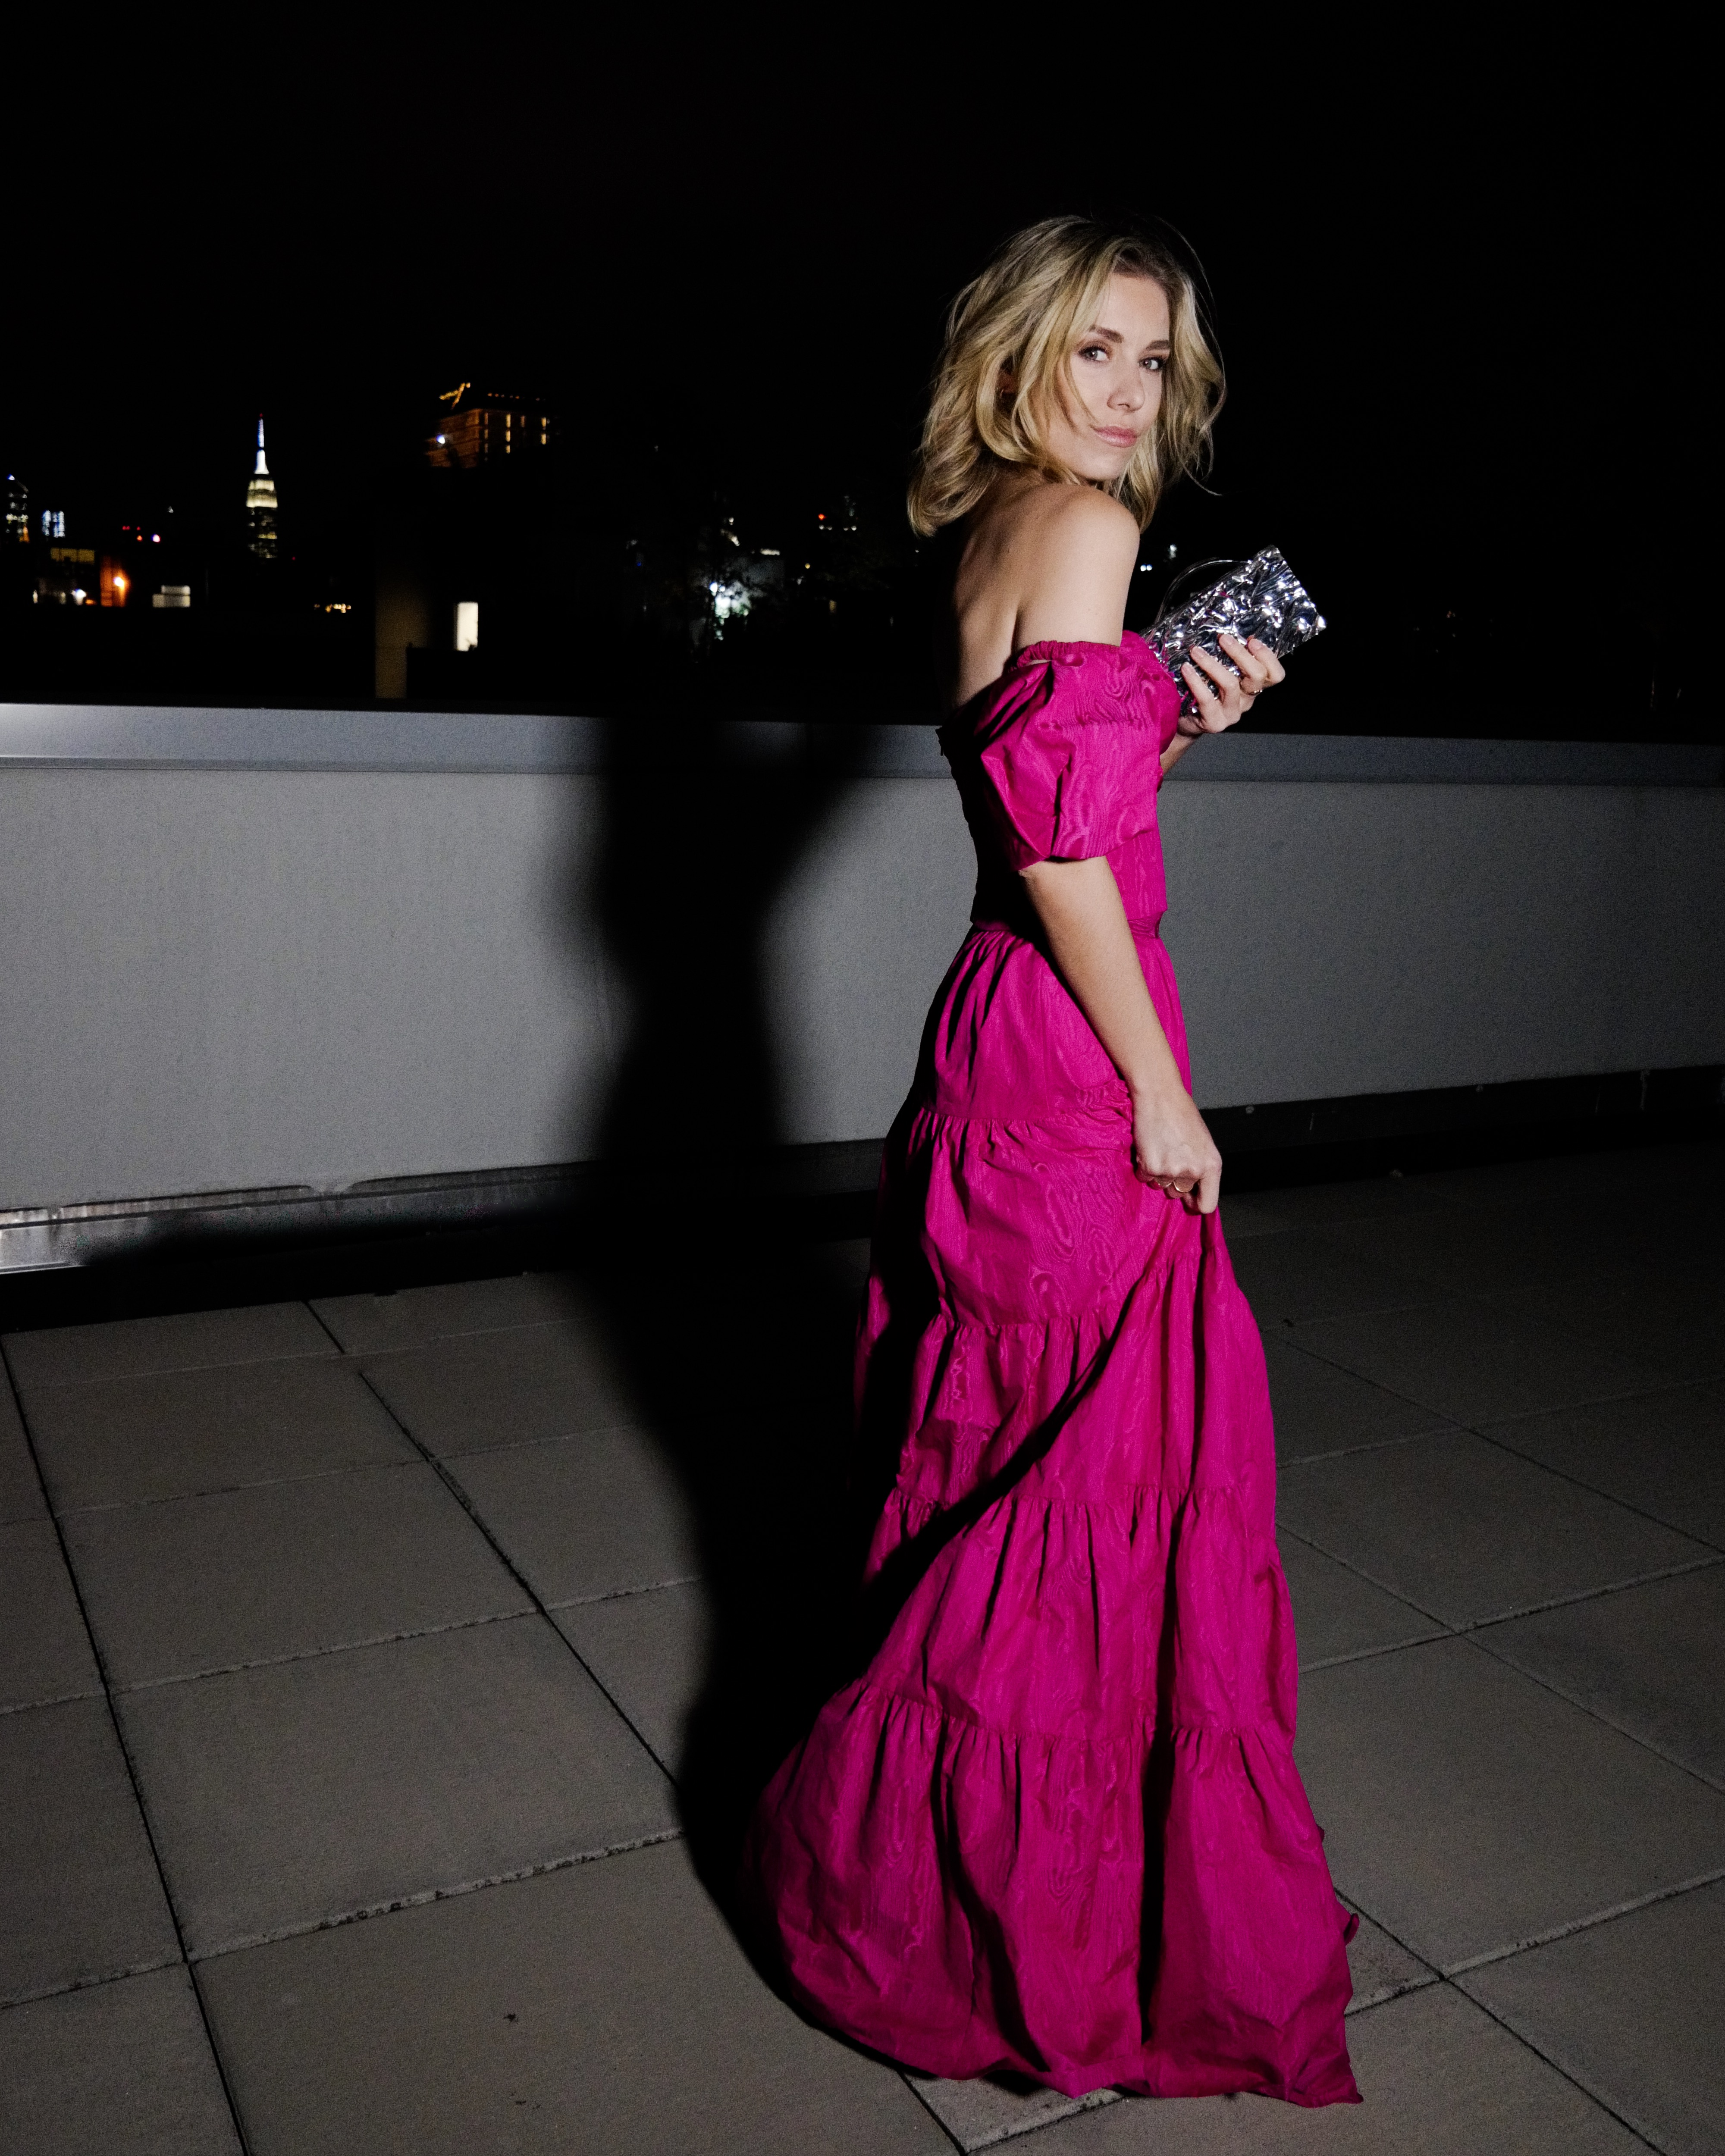 #floorlength #gown #eveninggown #longdress #weddingguest #pink #pinkdress #elegant #fuscia #nycblogger #newyork #springdress #springgown #party #event